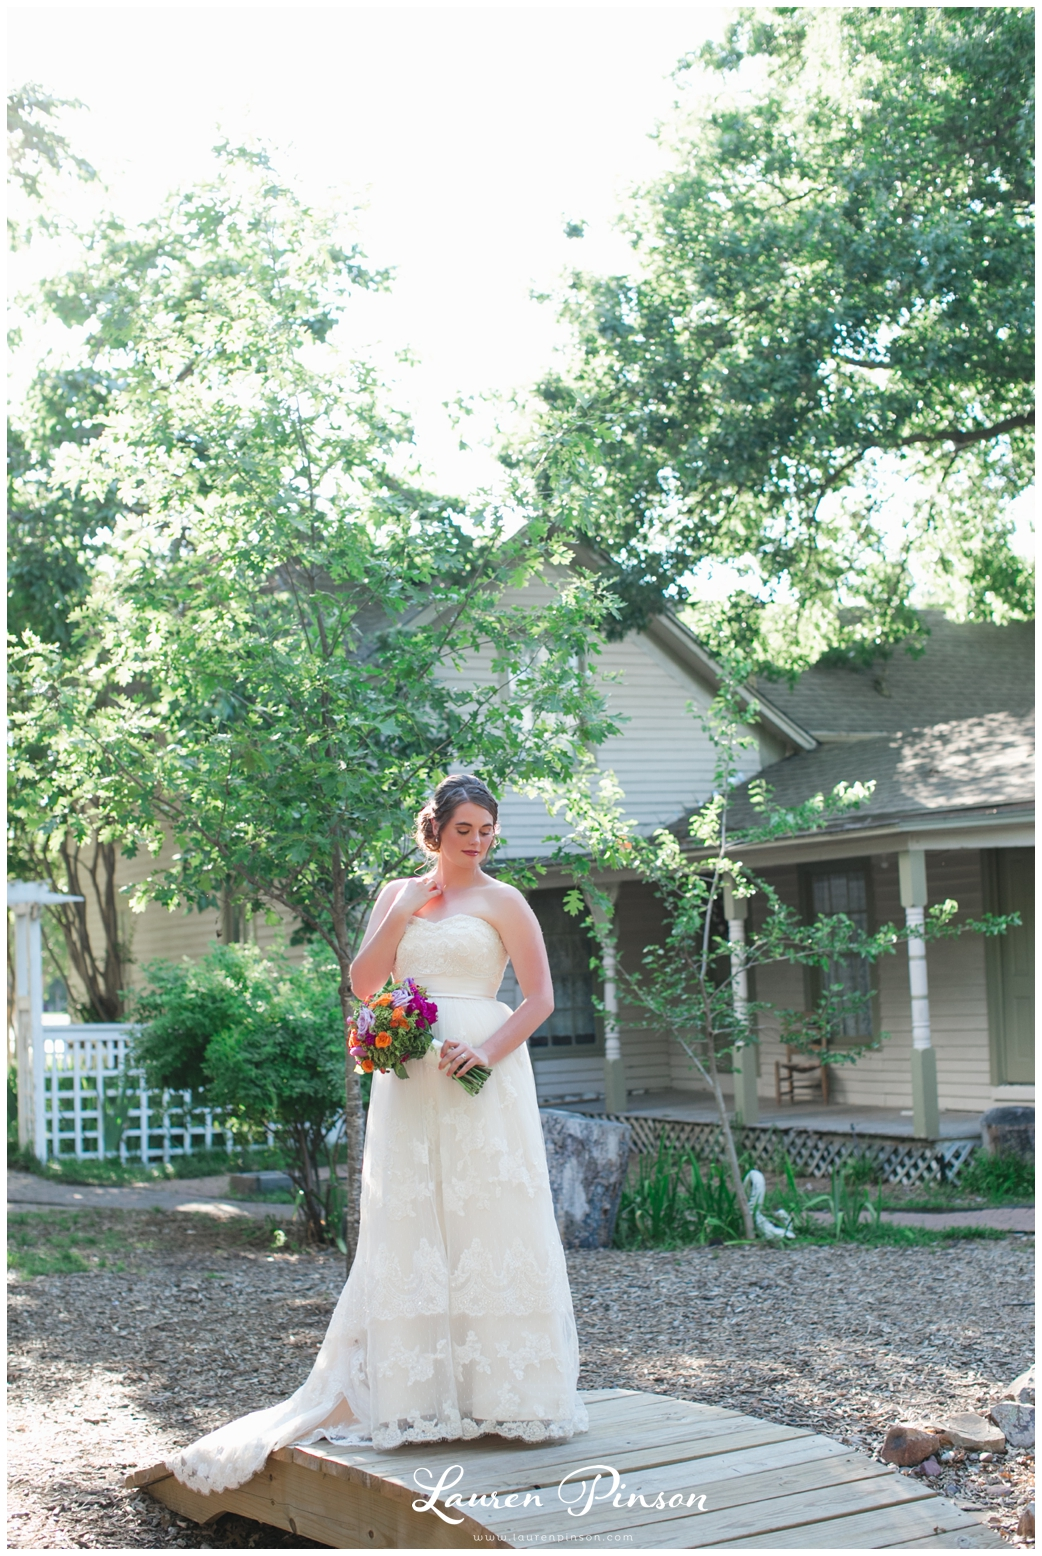 chestnut-square-downtown-mckinney-texas-wedding-photographer-sherman-northtexas-bridal-portraits-photography_0209.jpg